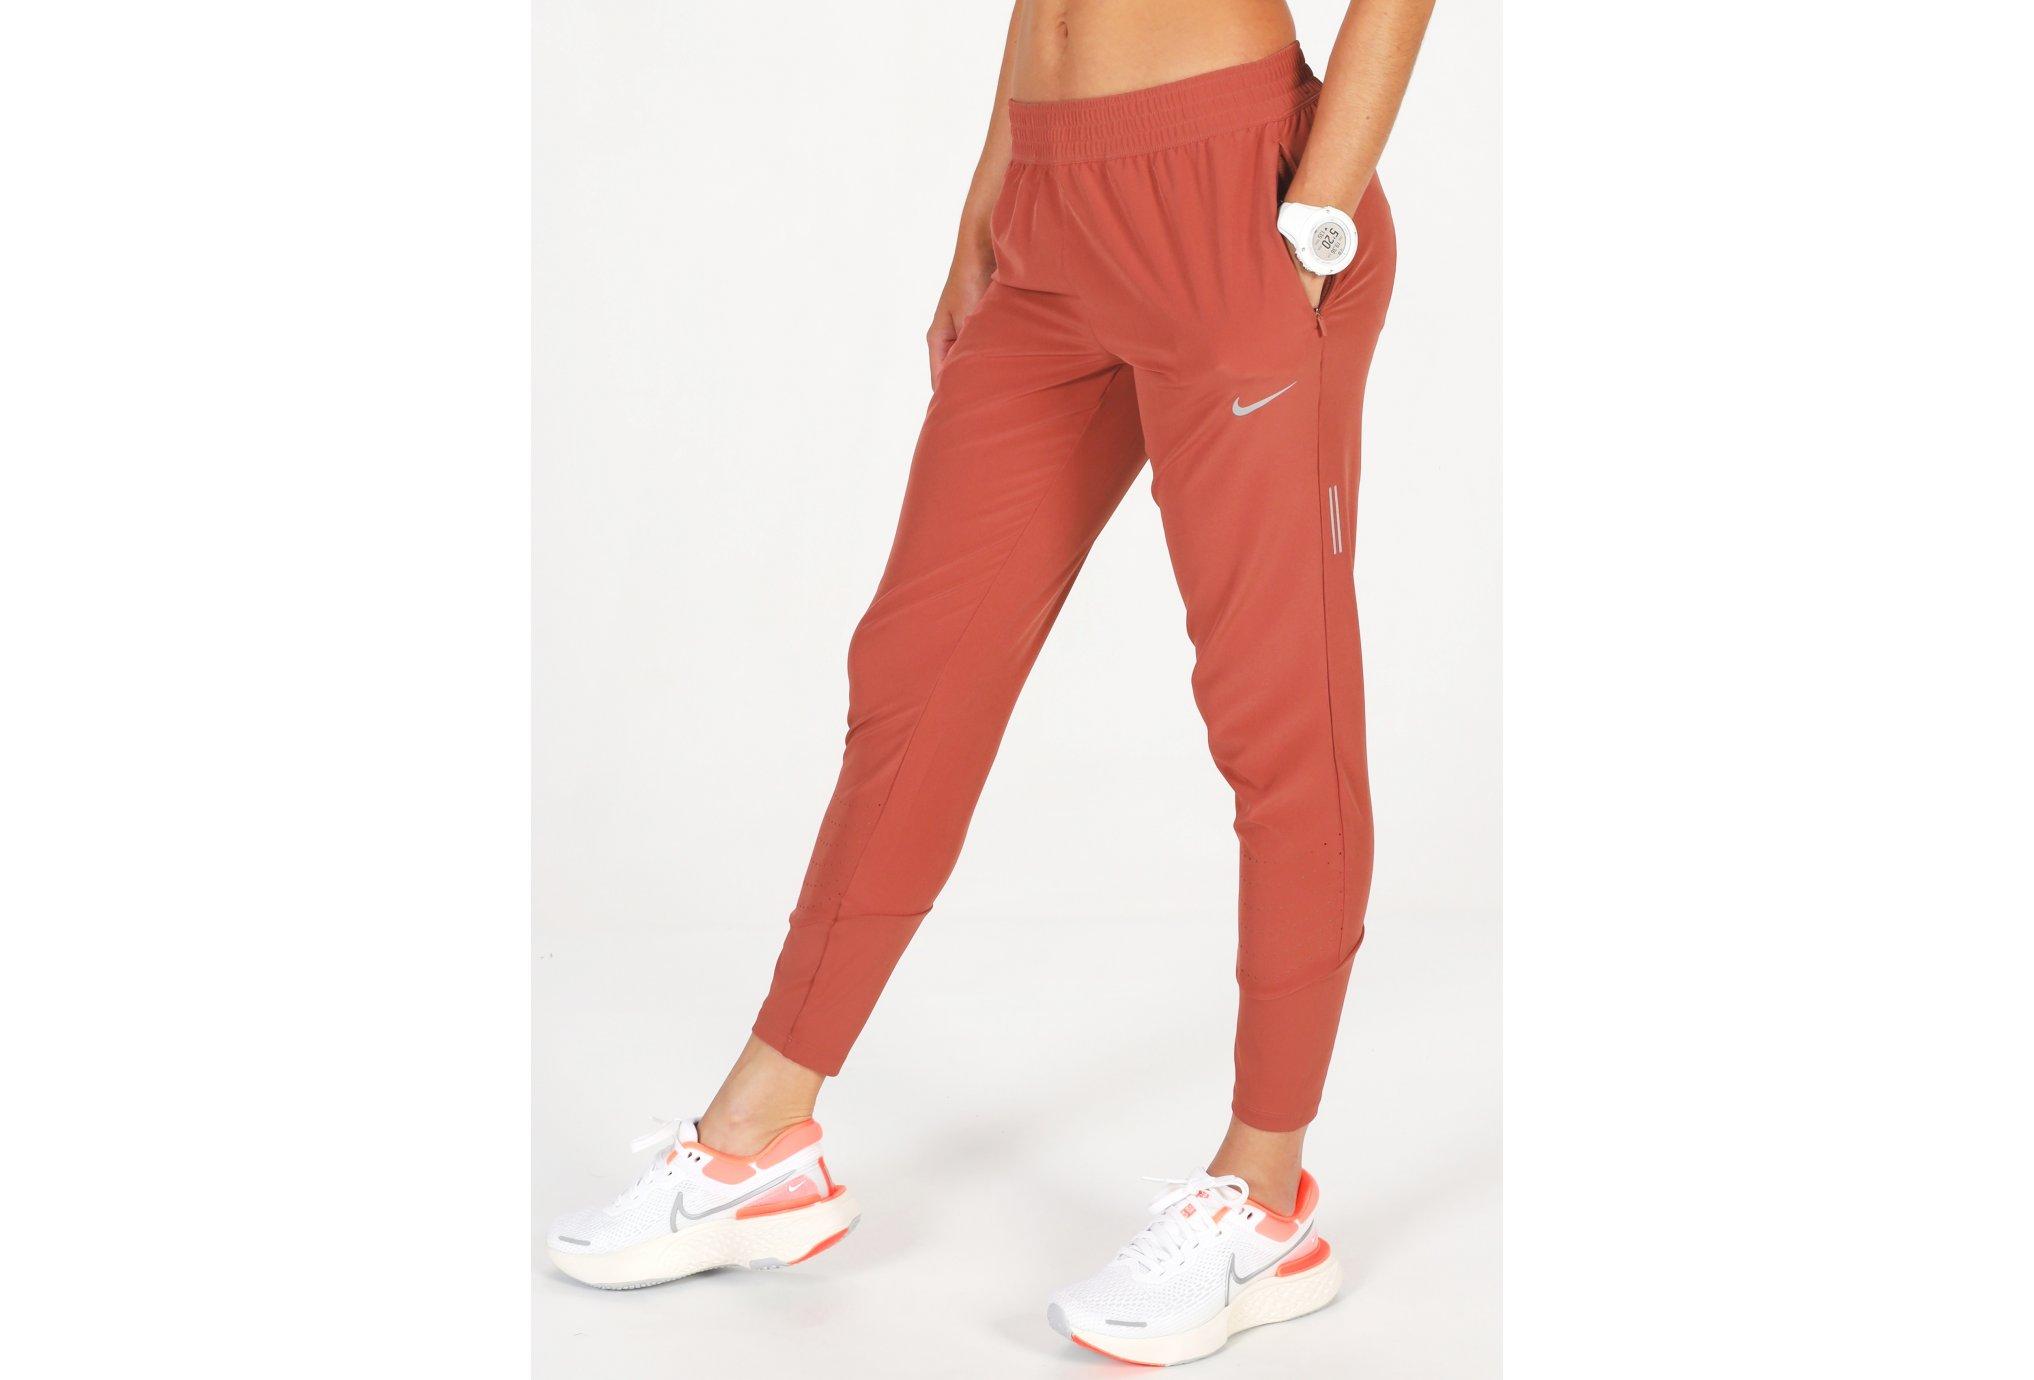 Nike Swift 2 W vêtement running femme